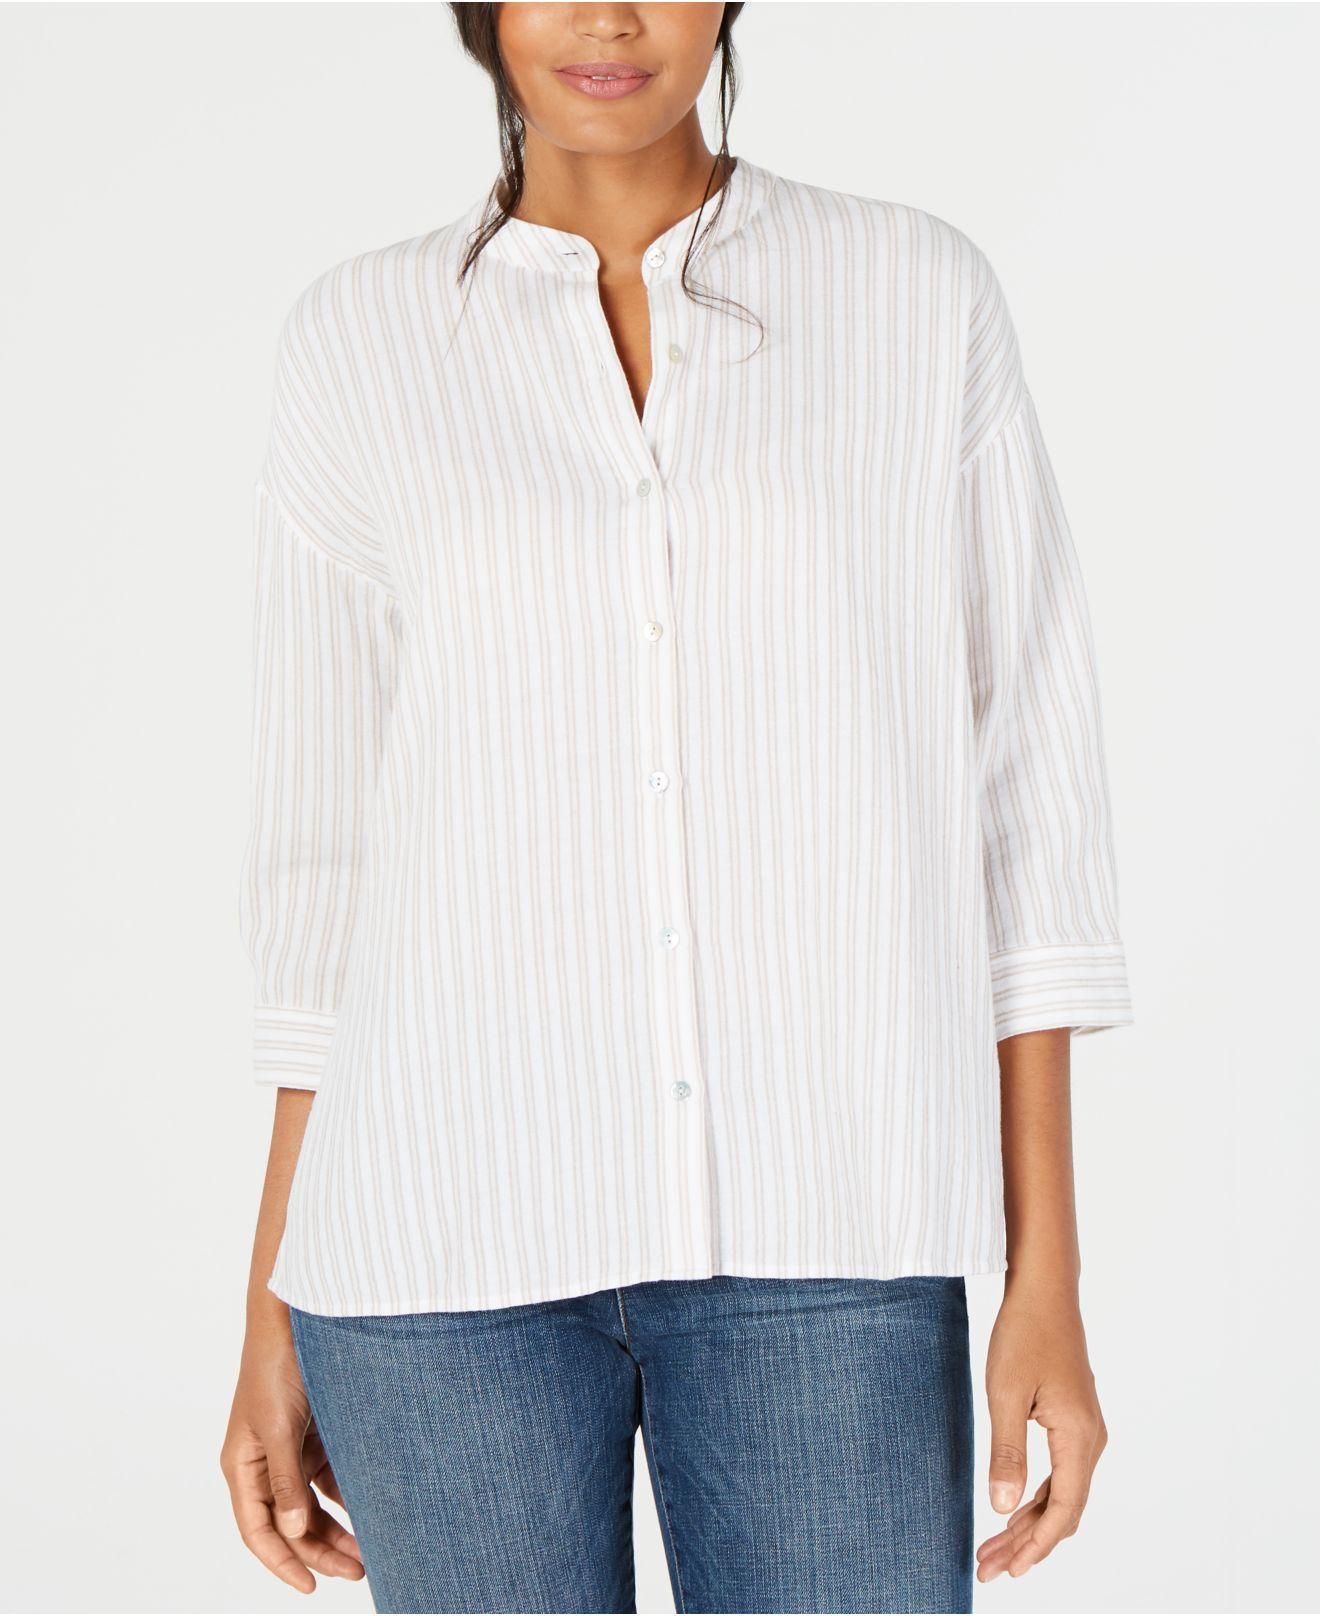 bdc407e8149 Lyst - Eileen Fisher Organic Cotton Shirt, Regular & Petite in White